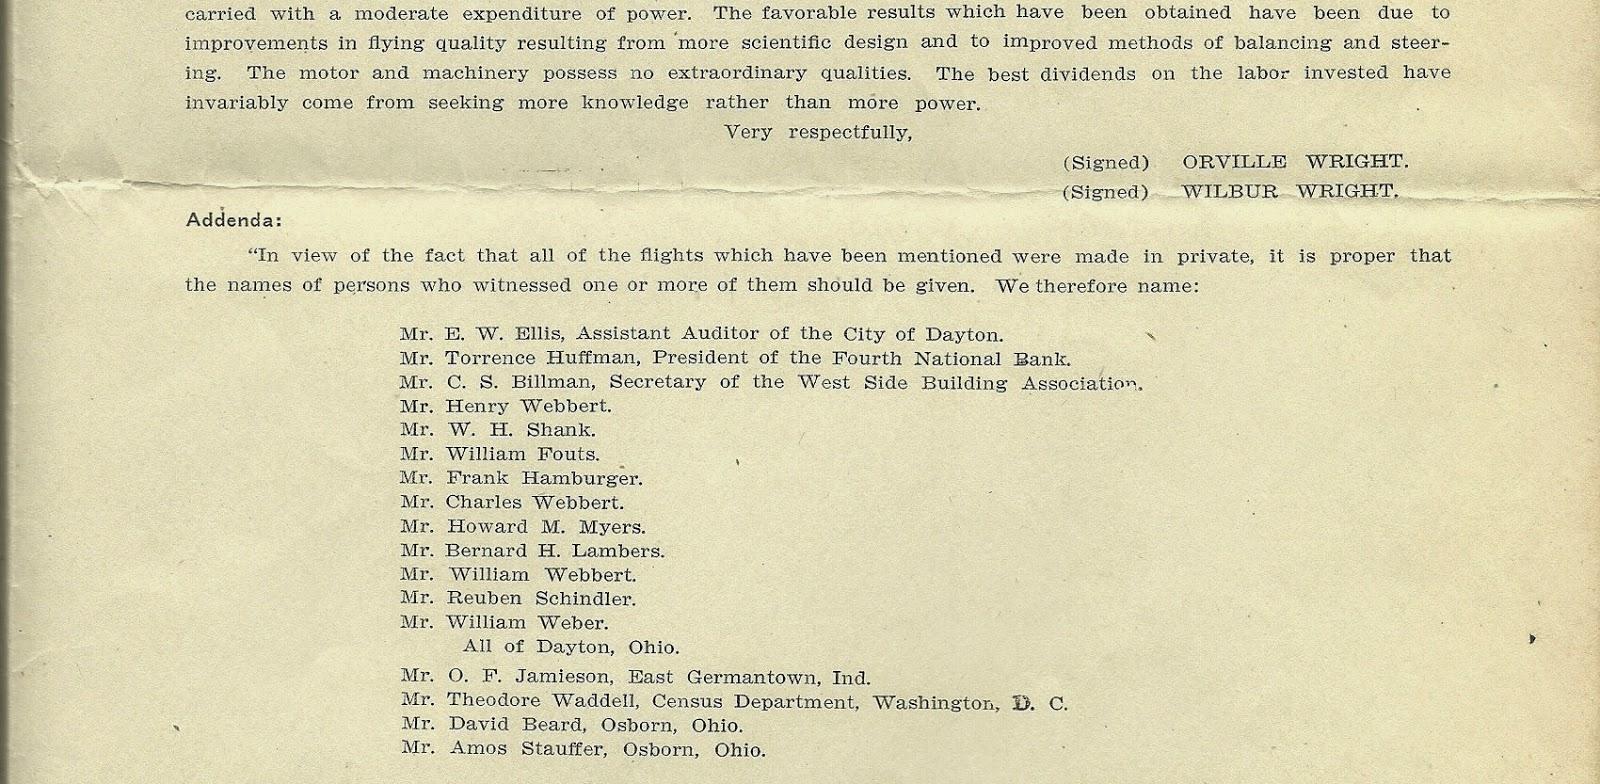 Wright Brothers 1905 flights.